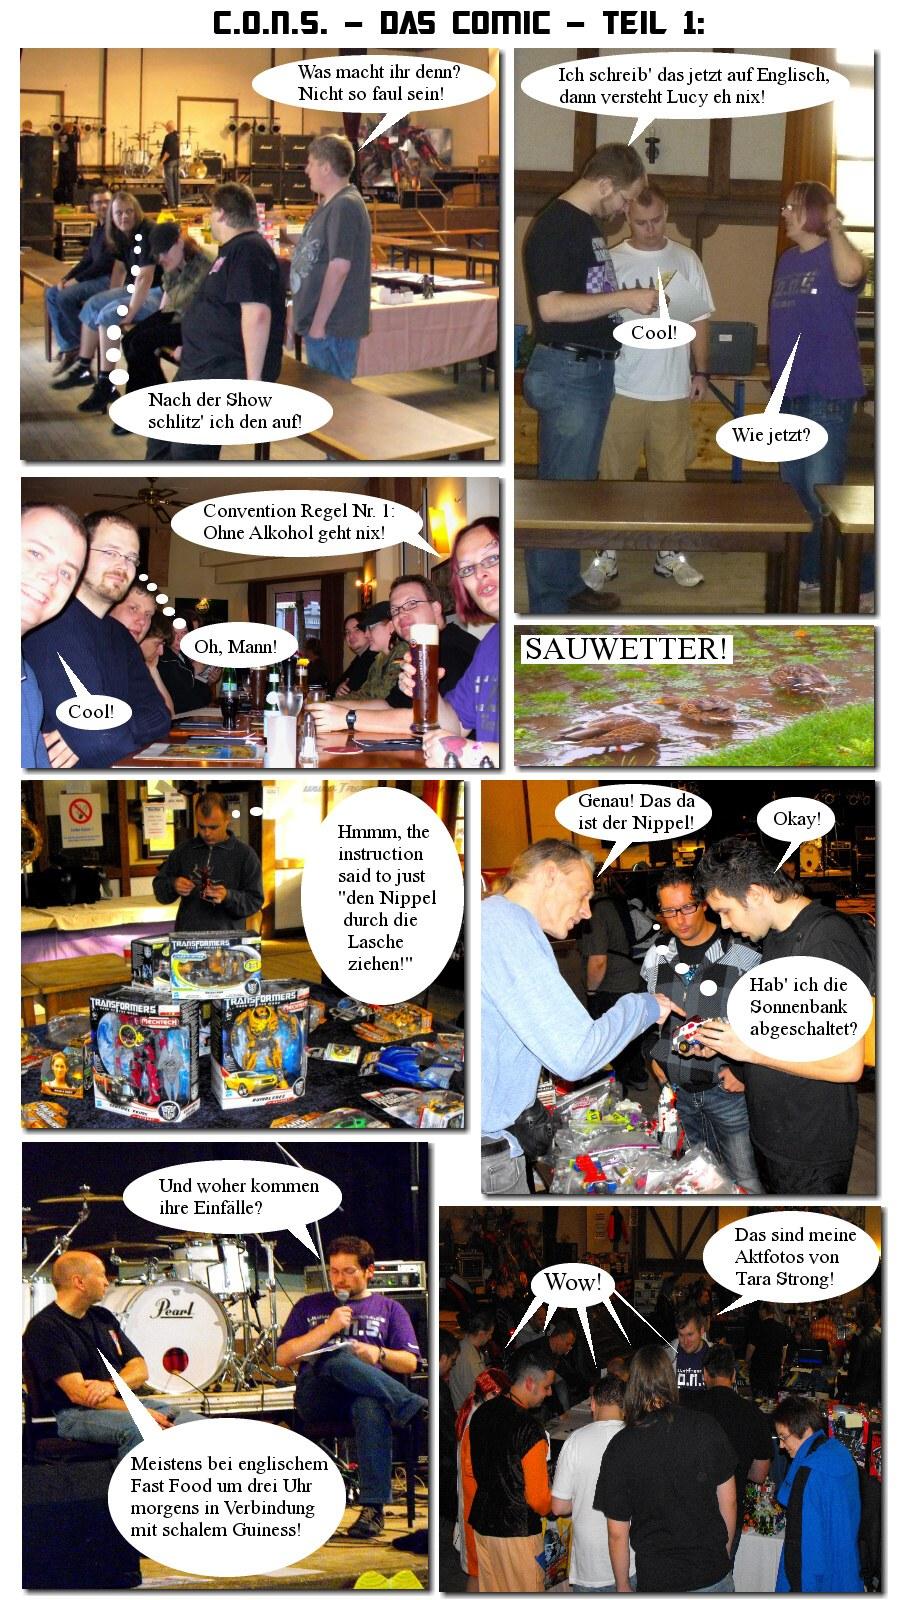 CONS Comic Teil 1